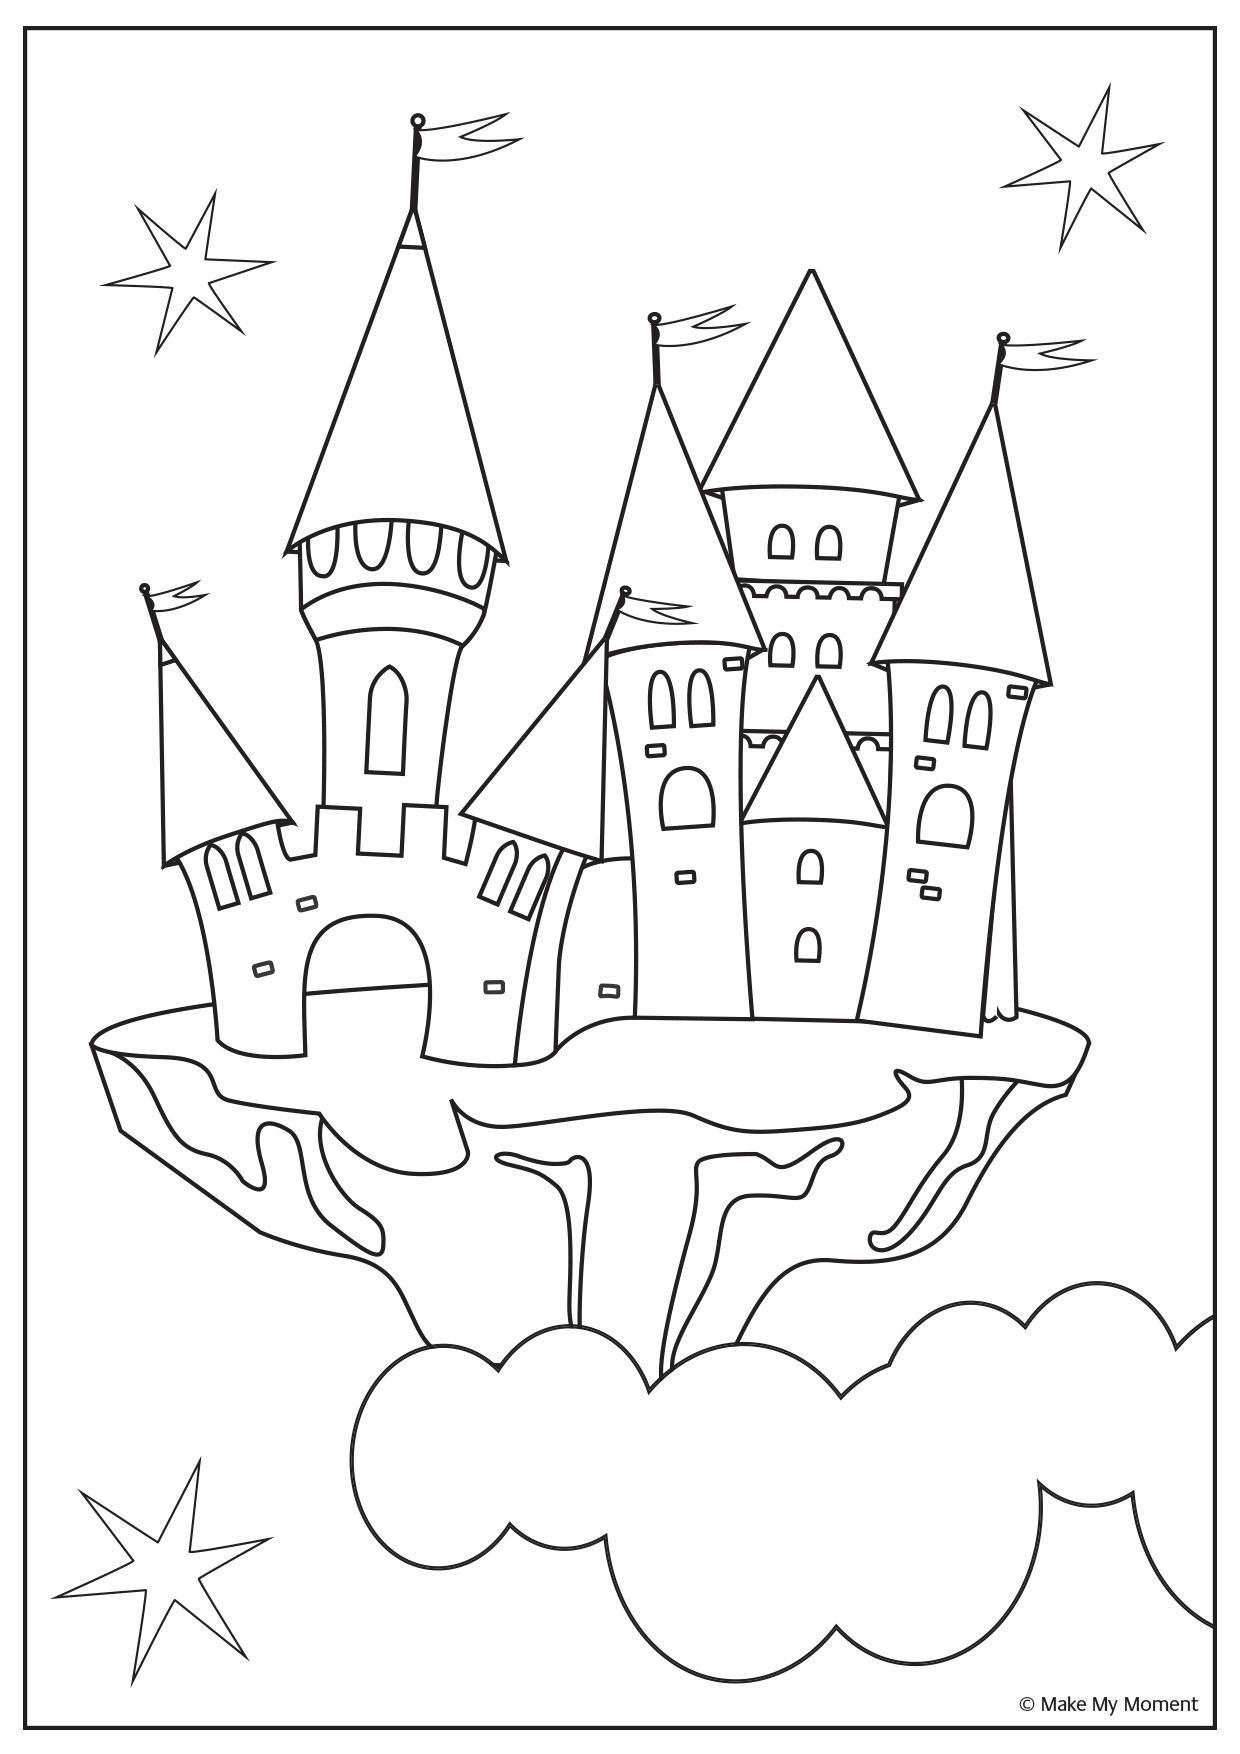 Kleurplaten Over Prinsessen.Beroemd Kleurplaten Prinsessen Frozen Tmn95 Agneswamu